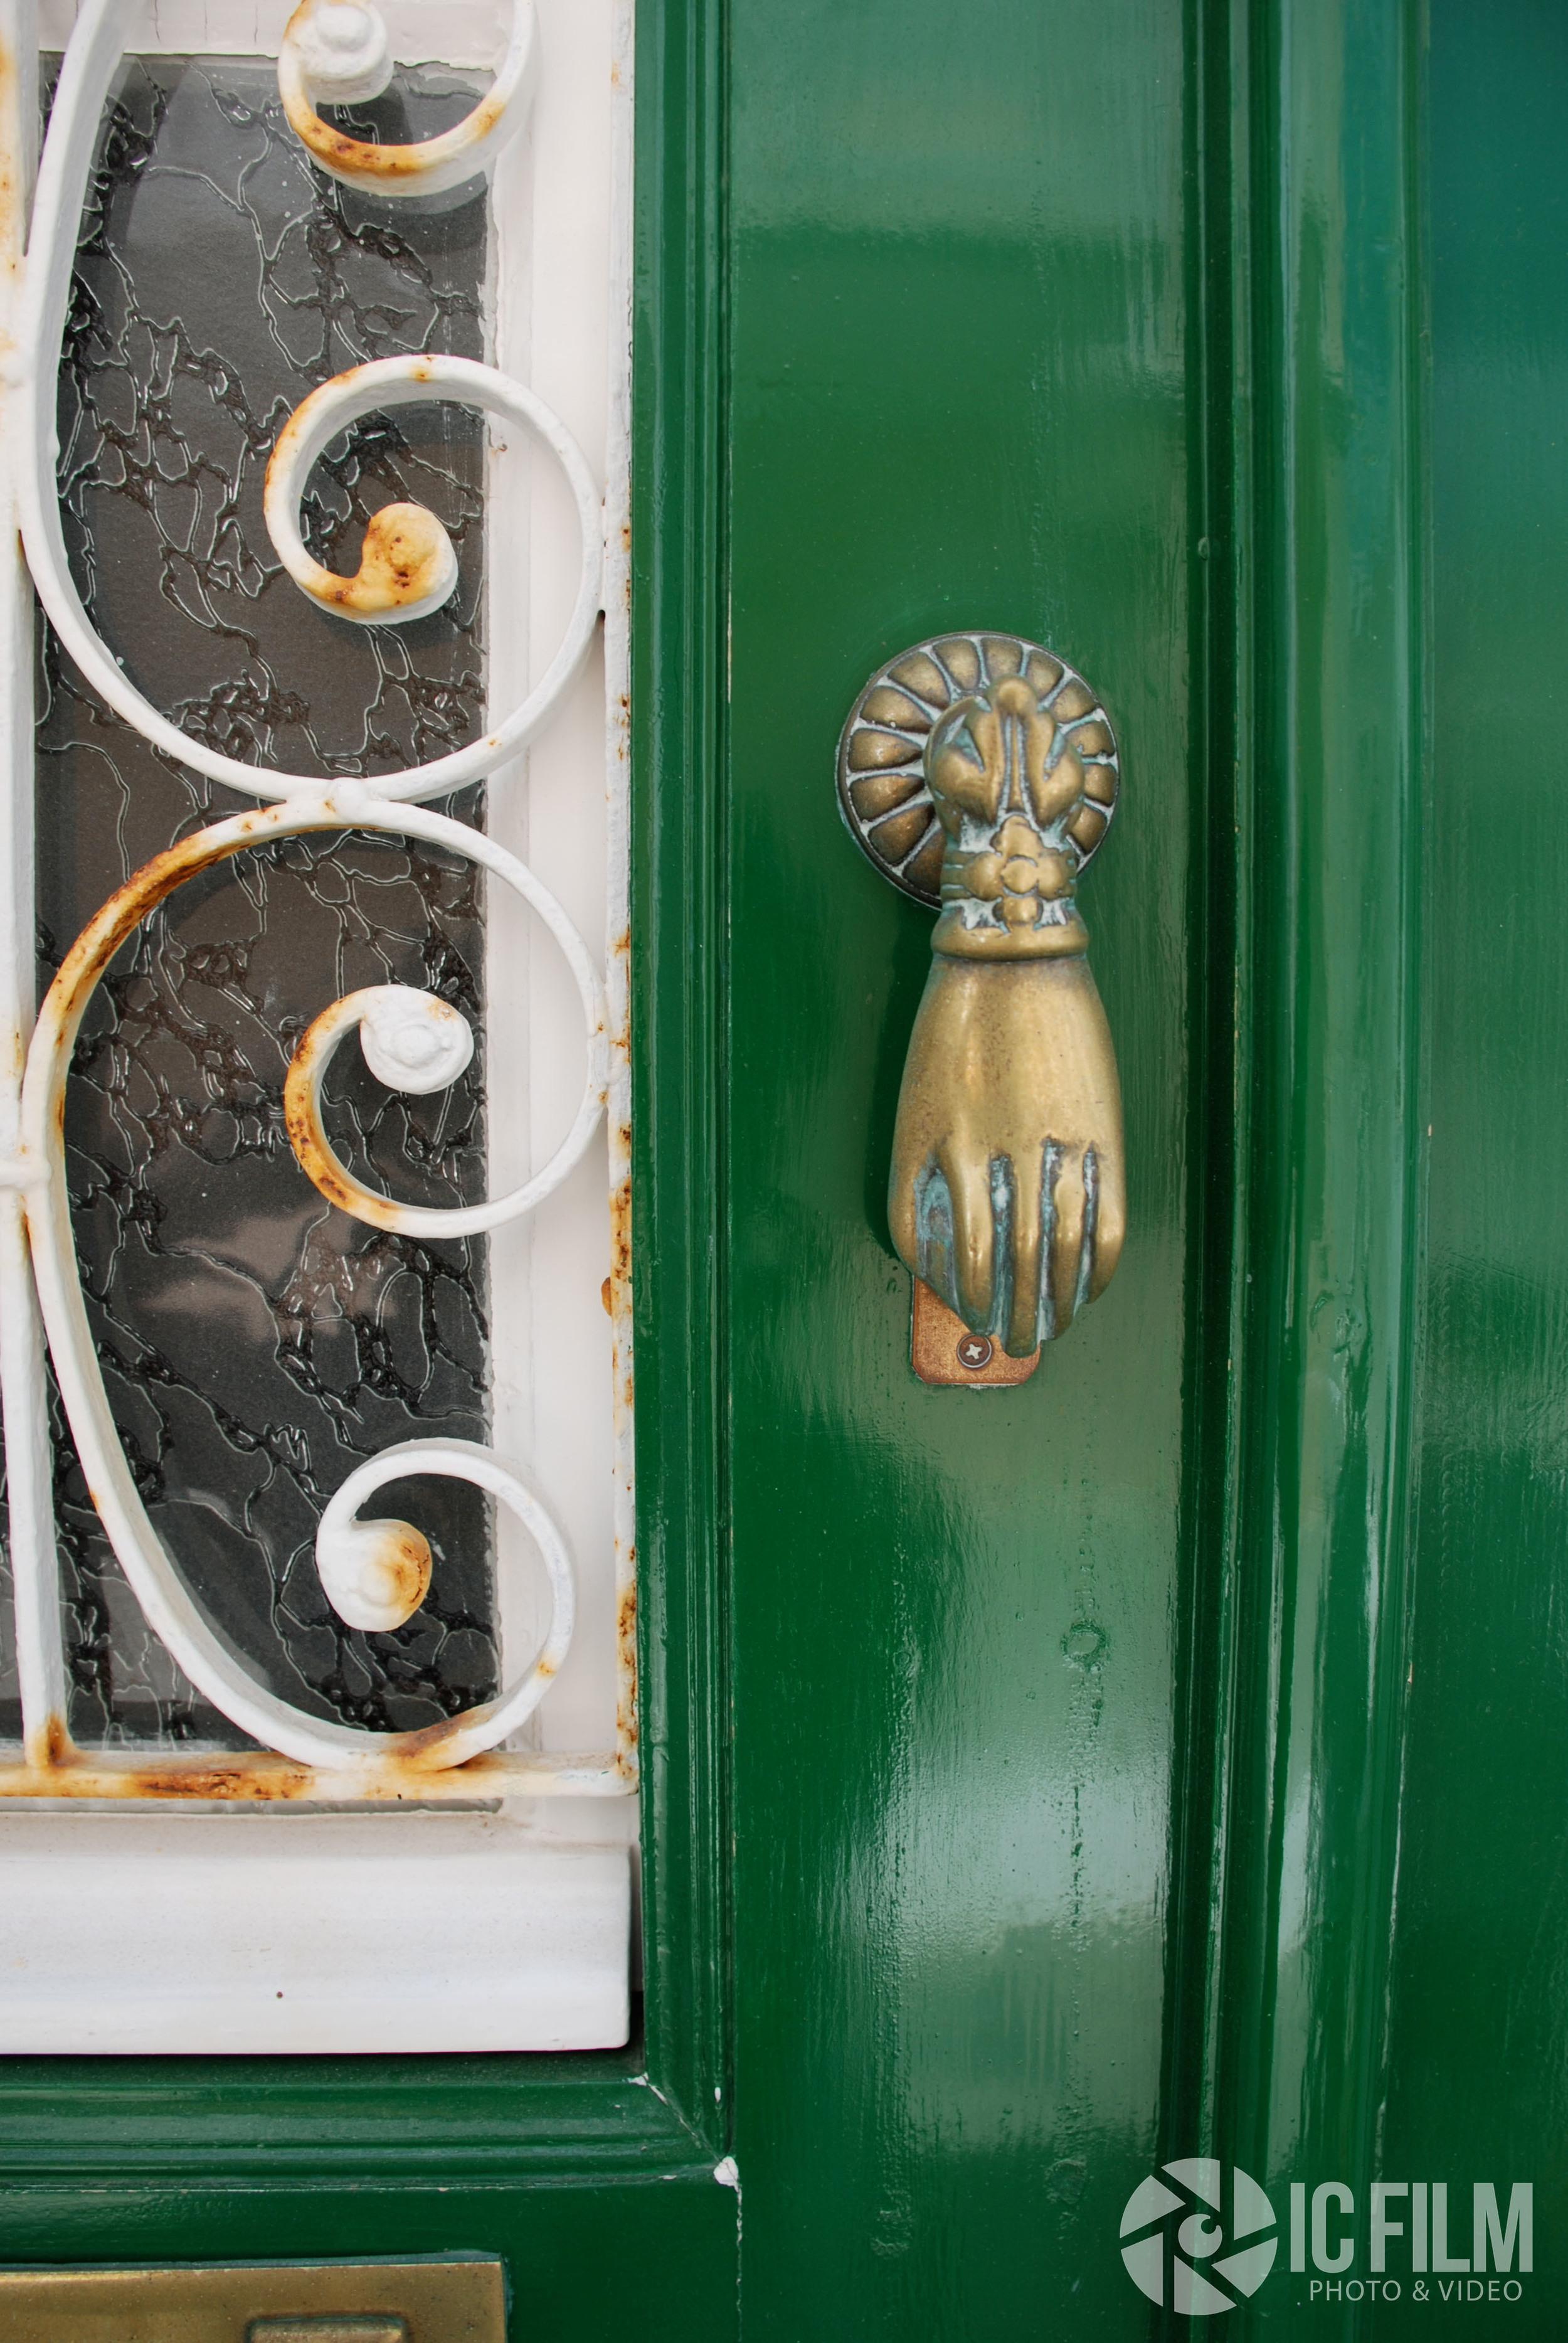 Doorknob Series, Andros_3.jpg